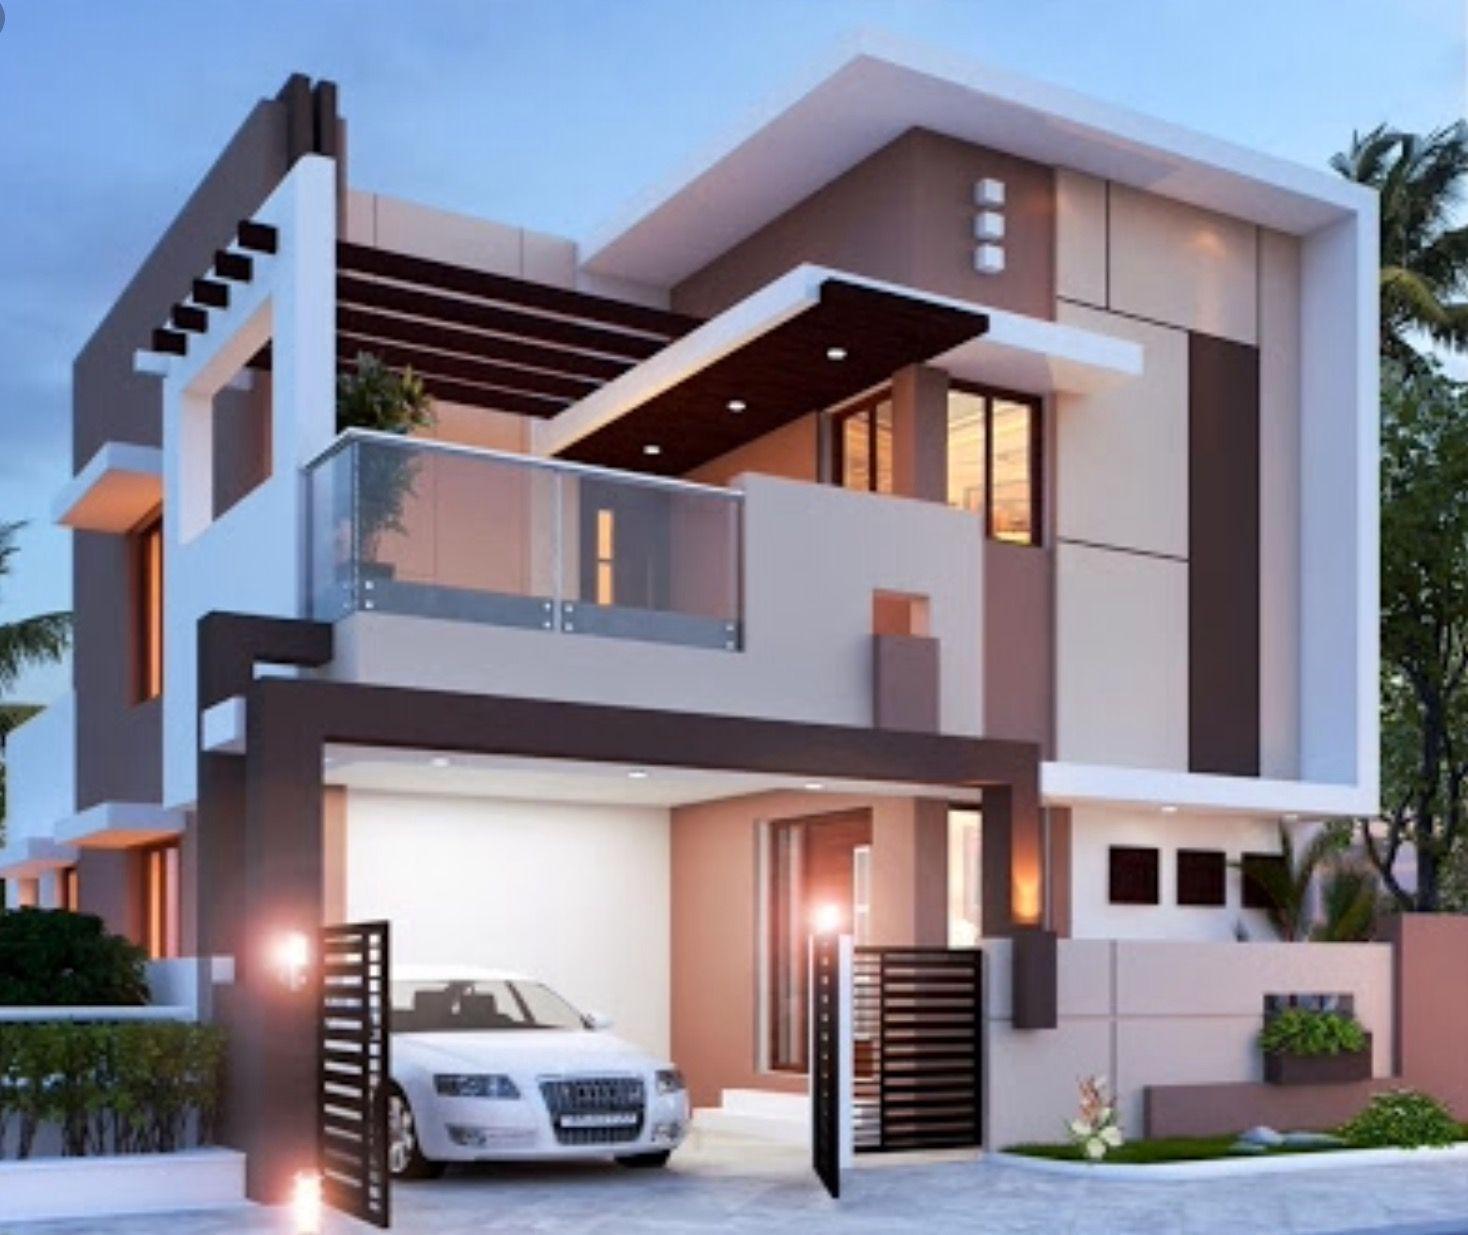 23 In 2020 Duplex House Design Bungalow House Design Cool House Designs